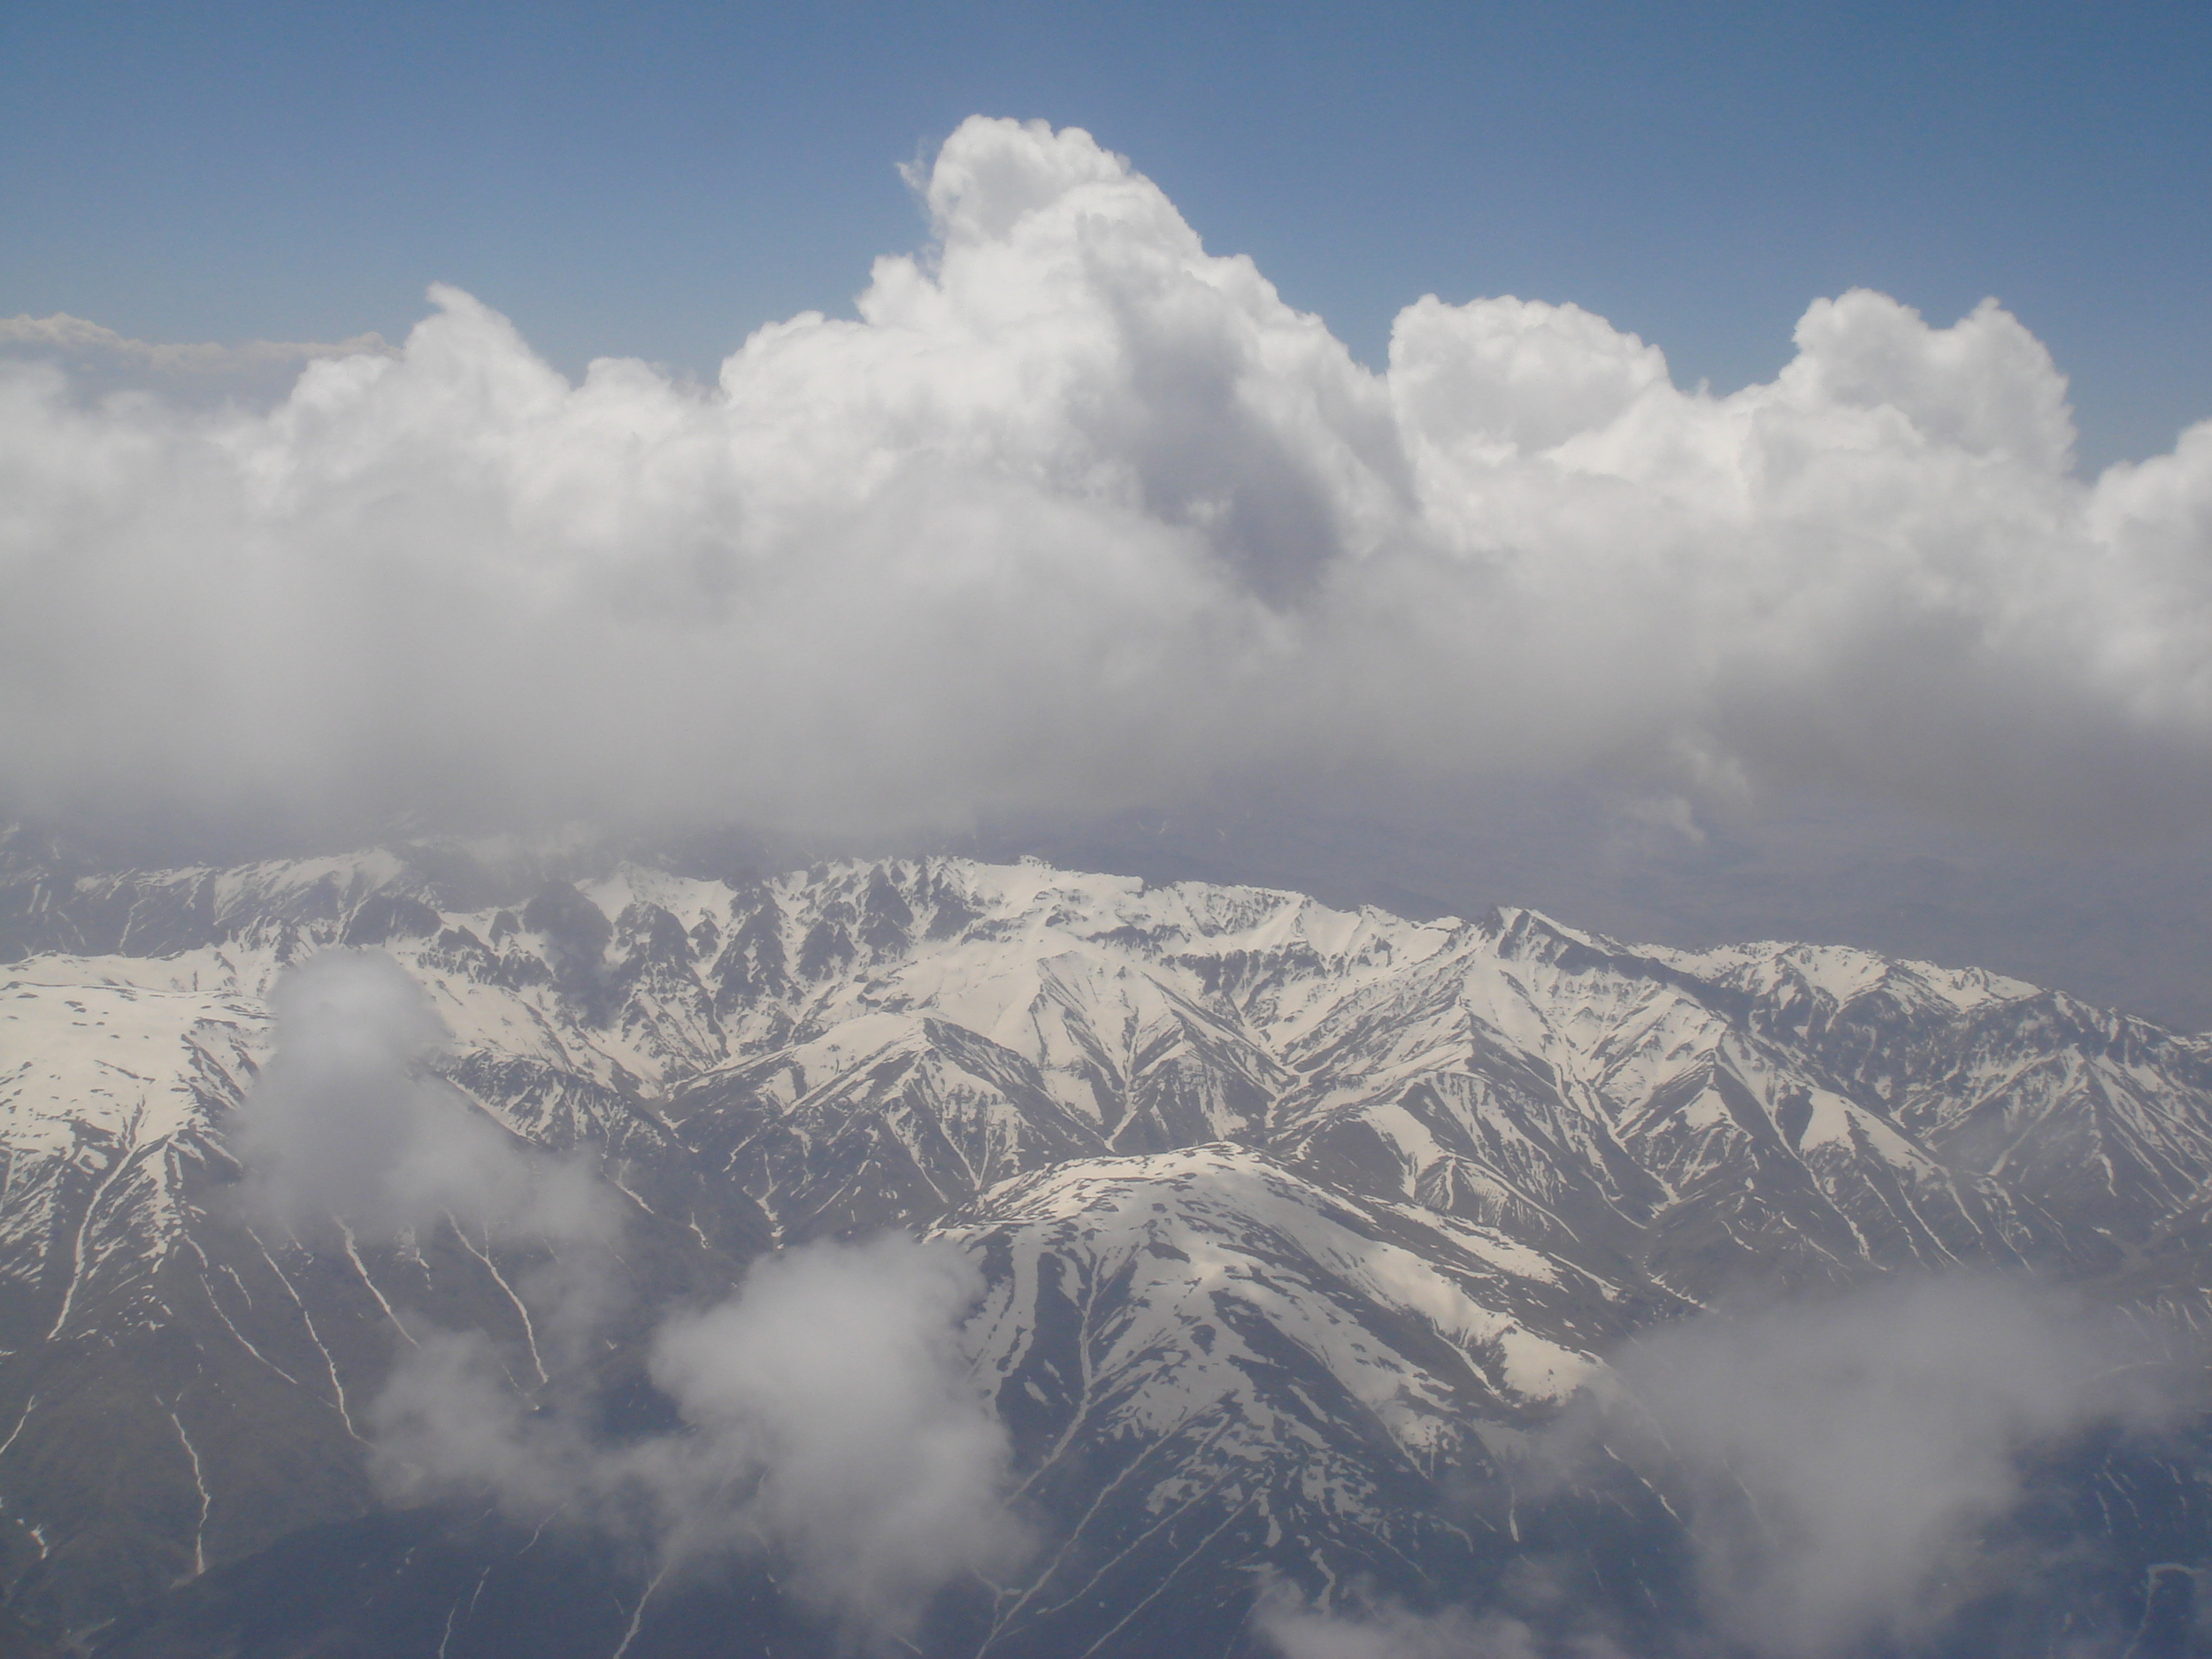 Glacier Environments - Hazards and Disaster